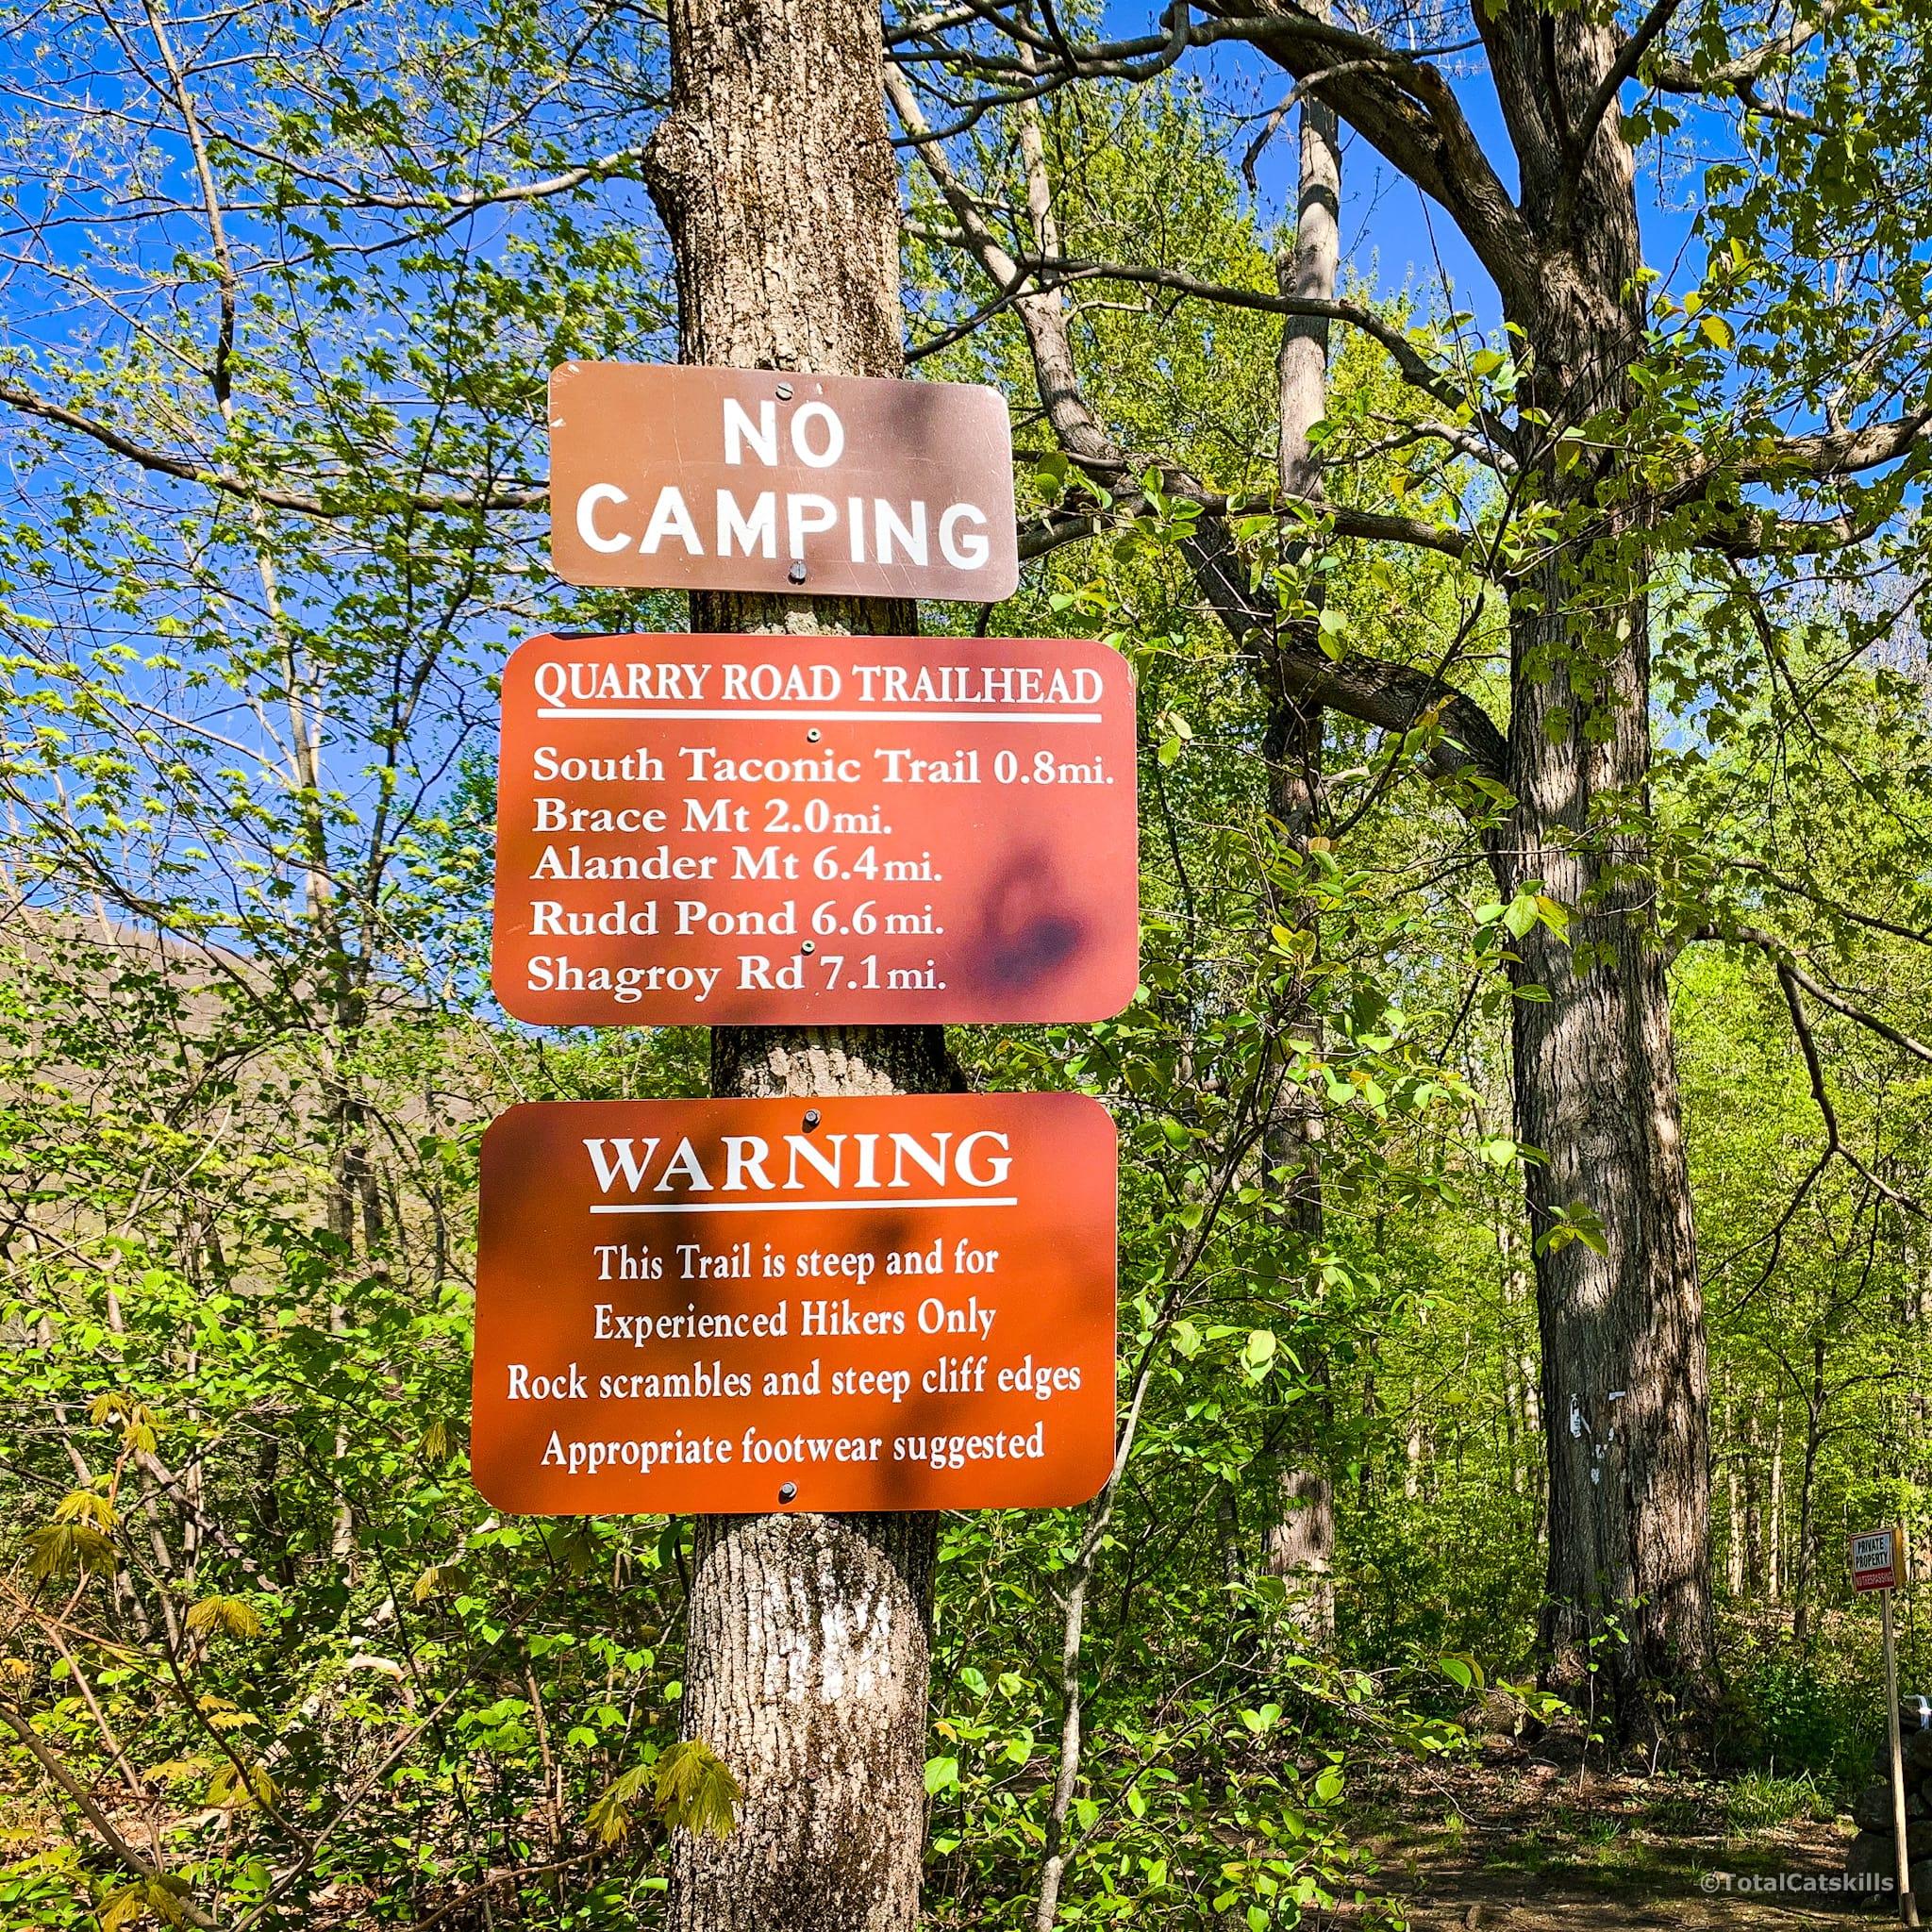 signs on tree